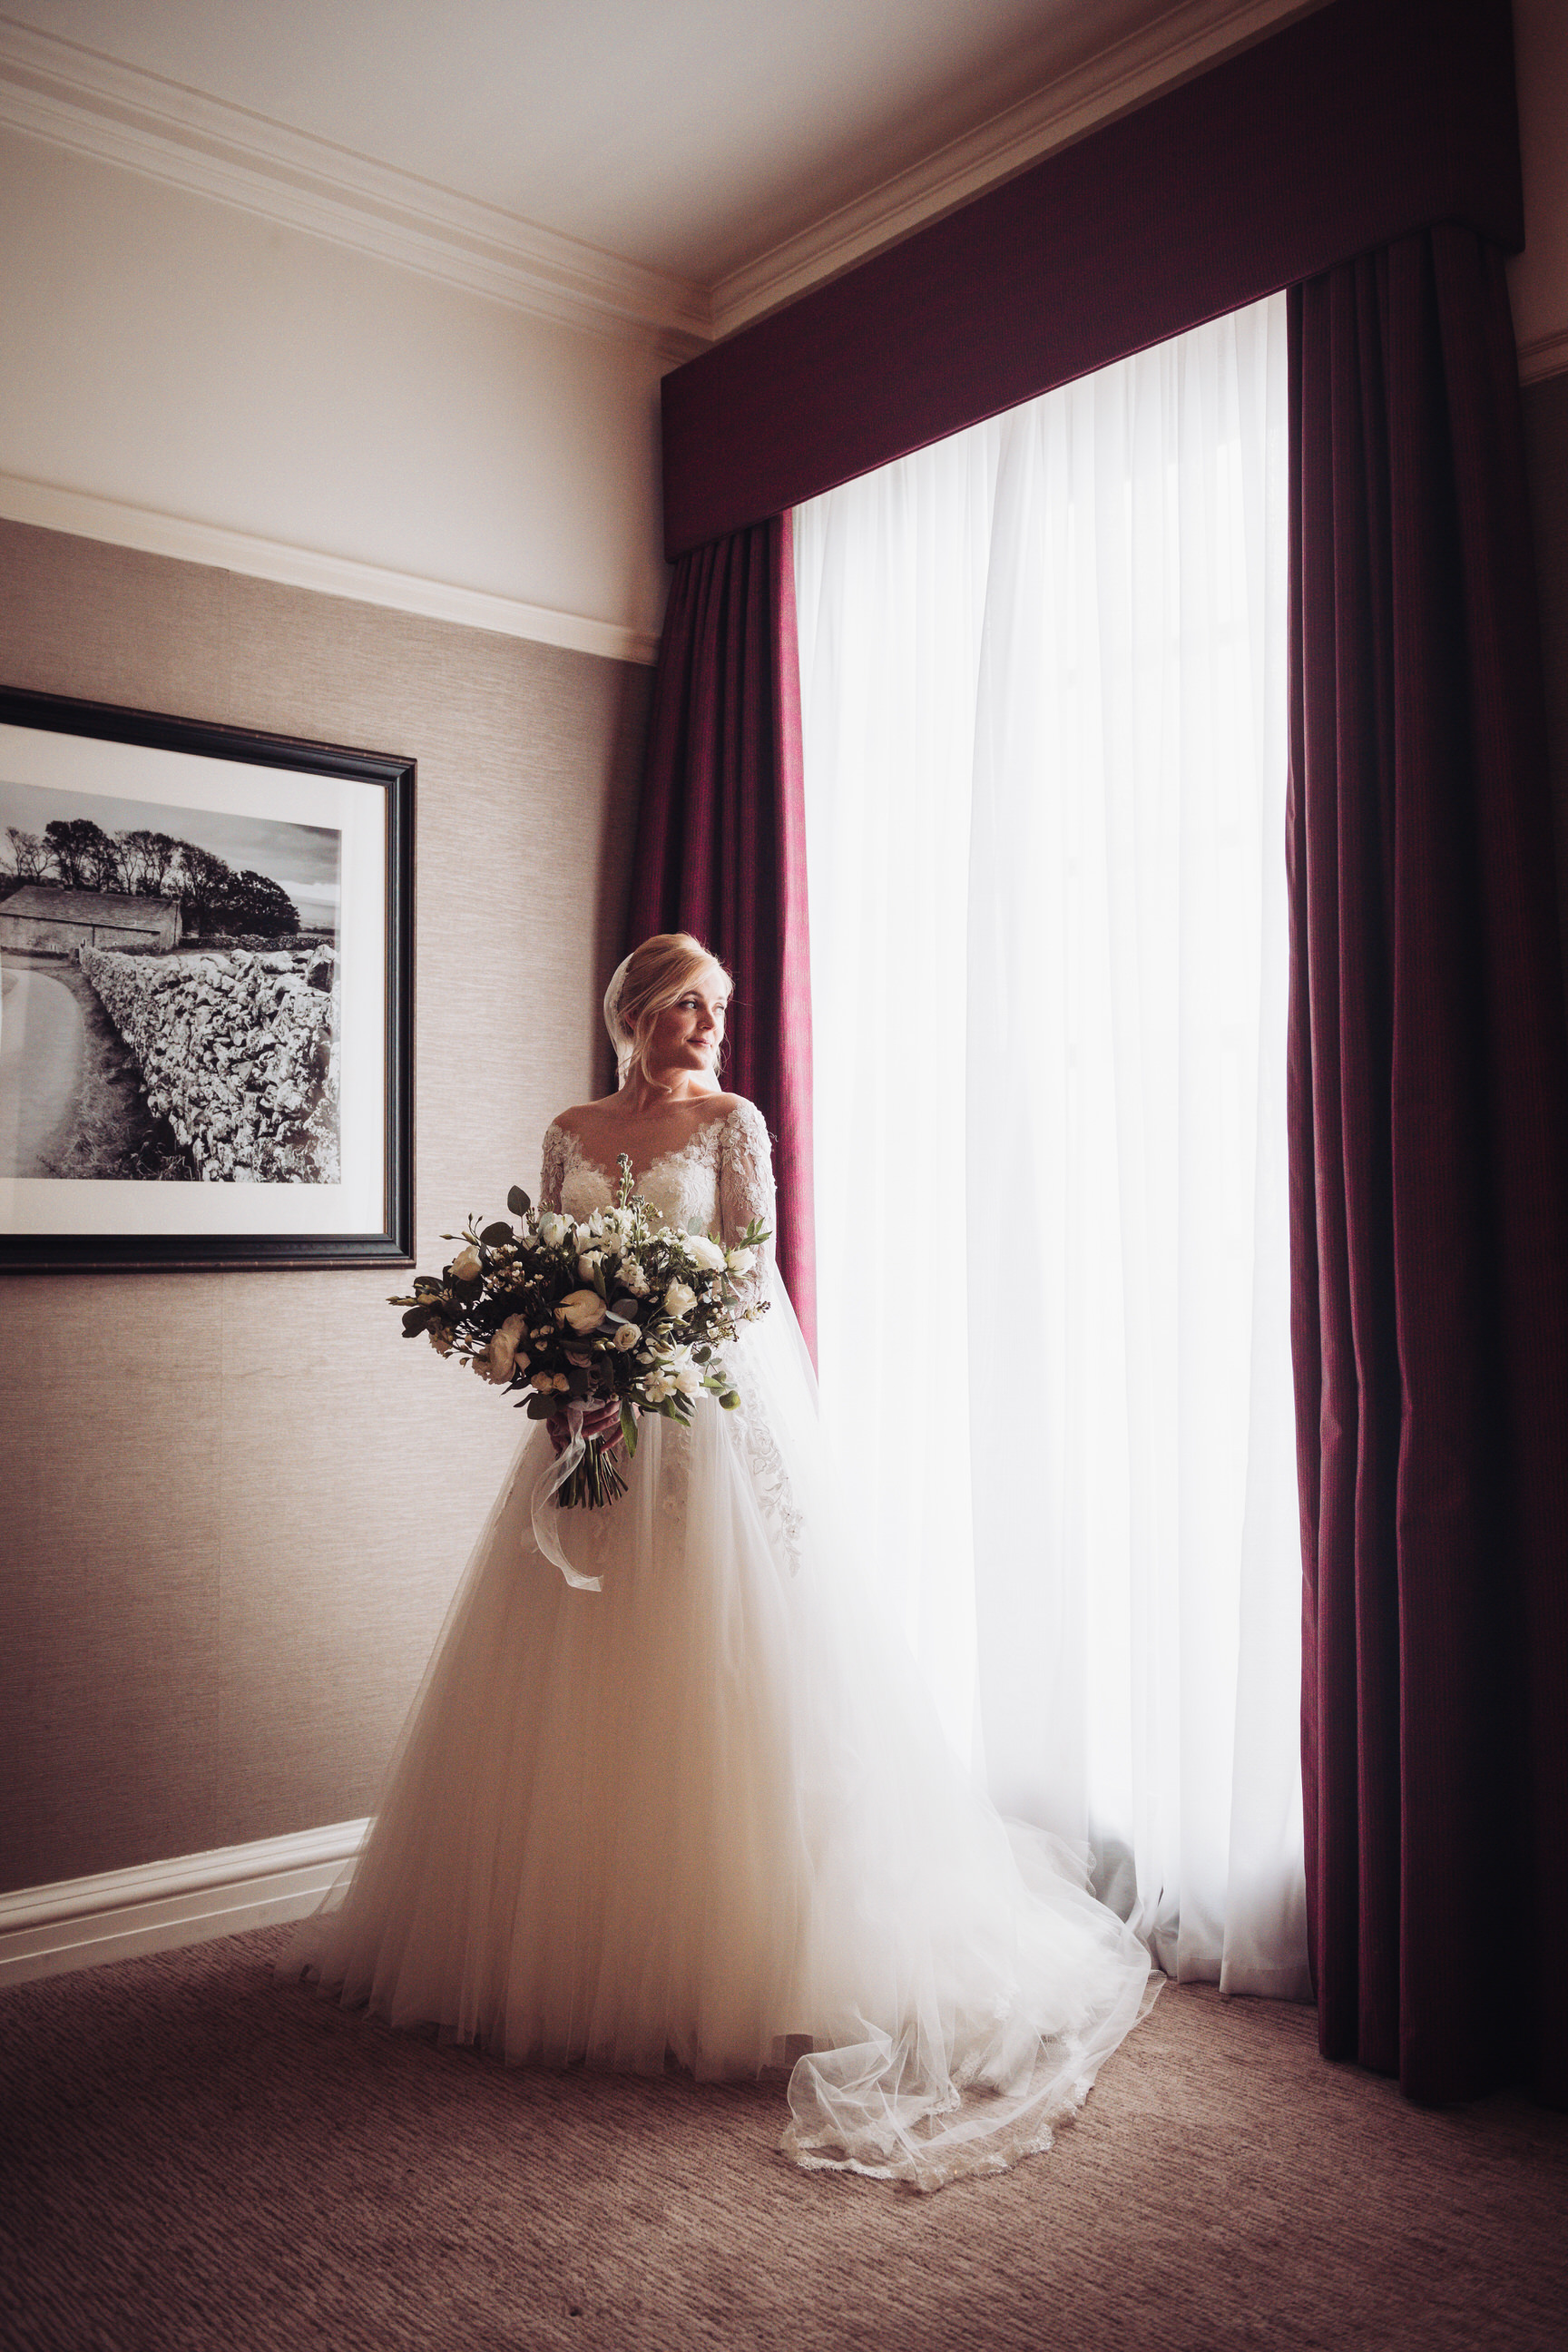 The-Grand-Hotel-York-wedding-photographer-3.jpg